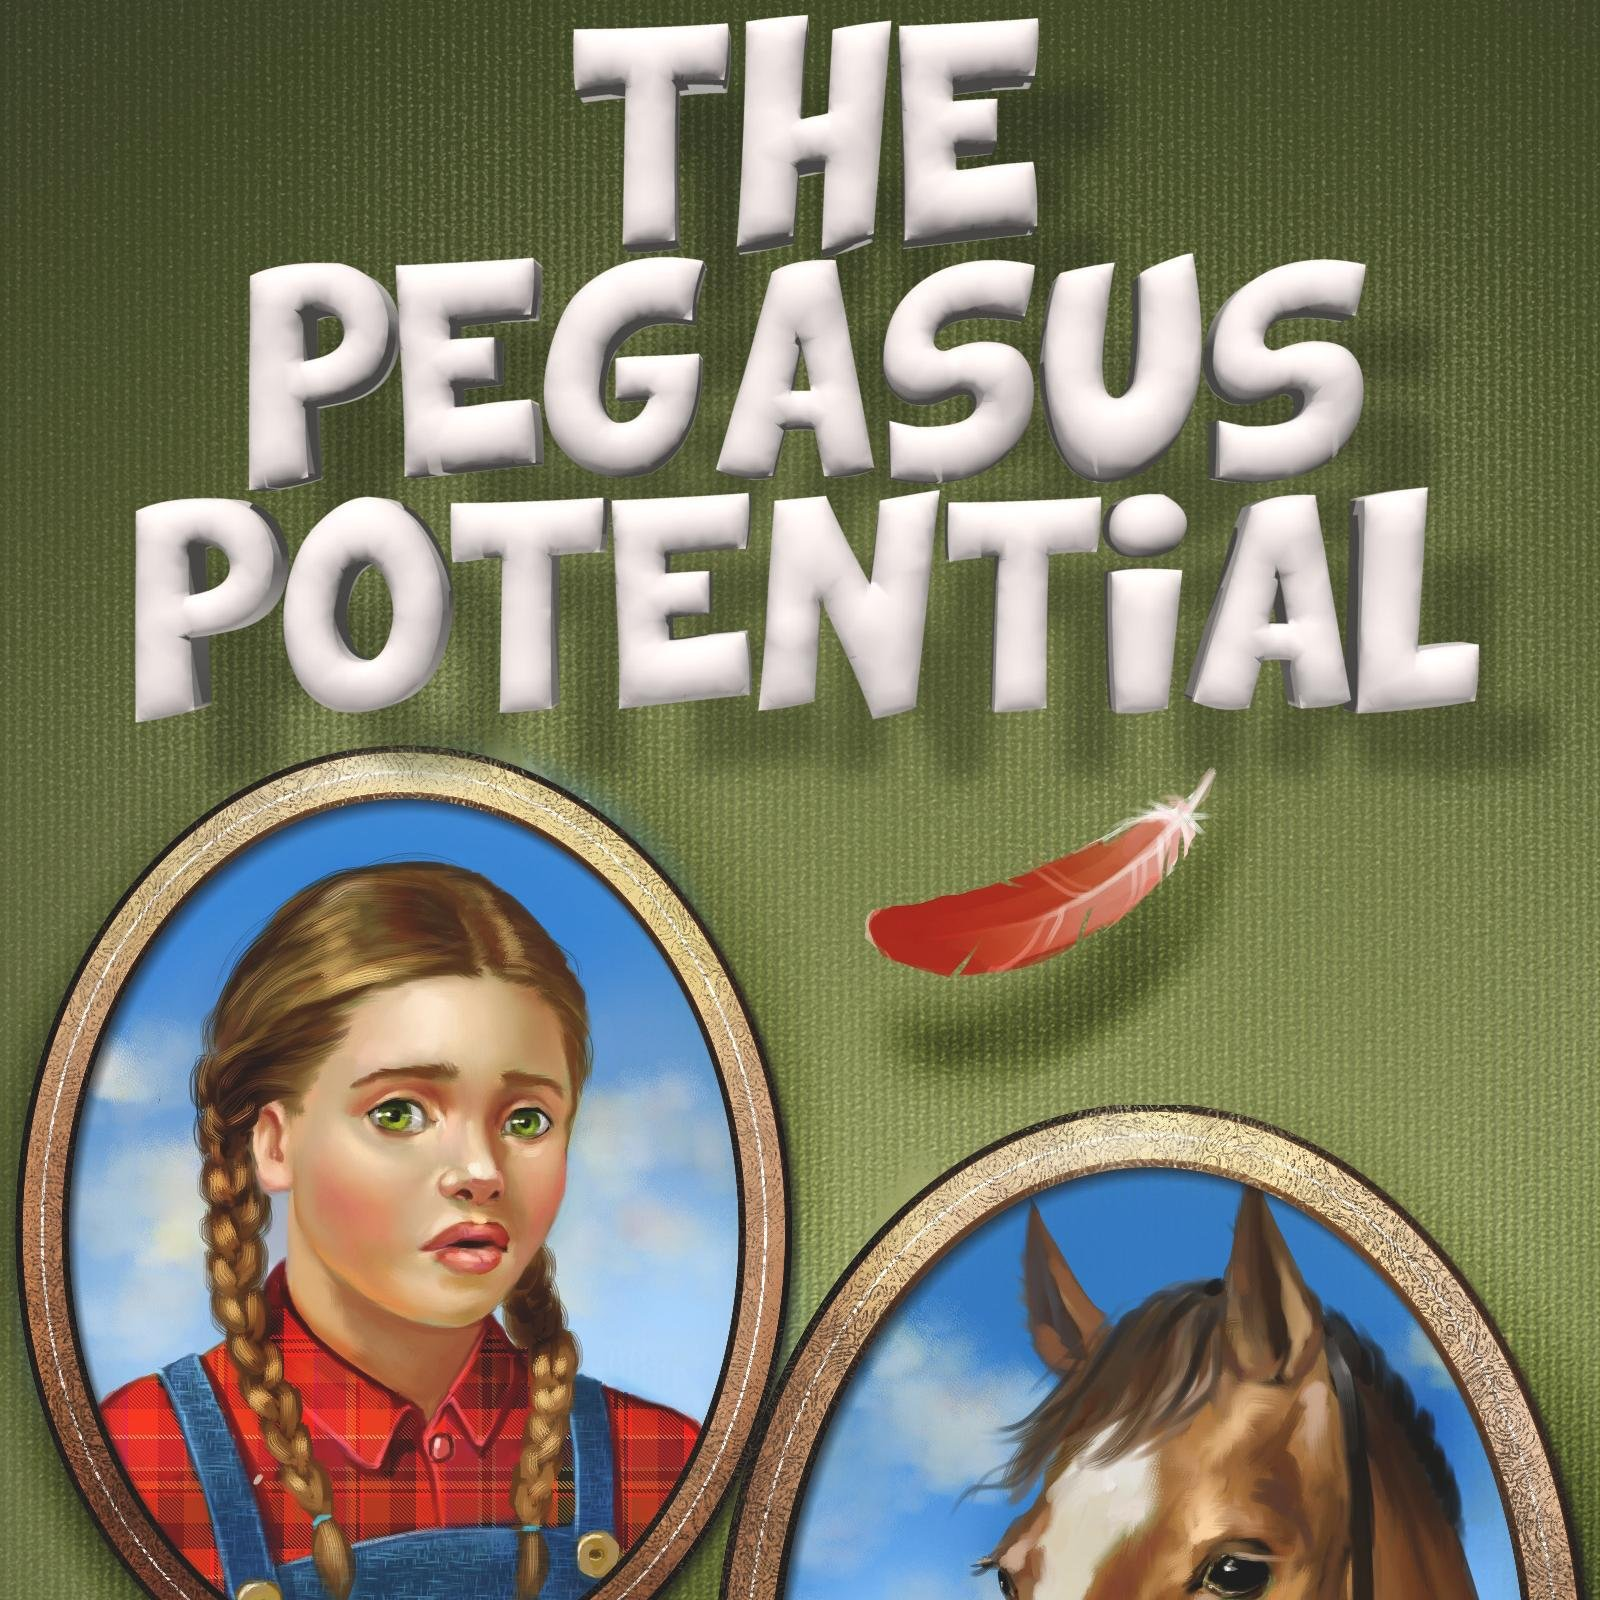 @PegasusAuthor